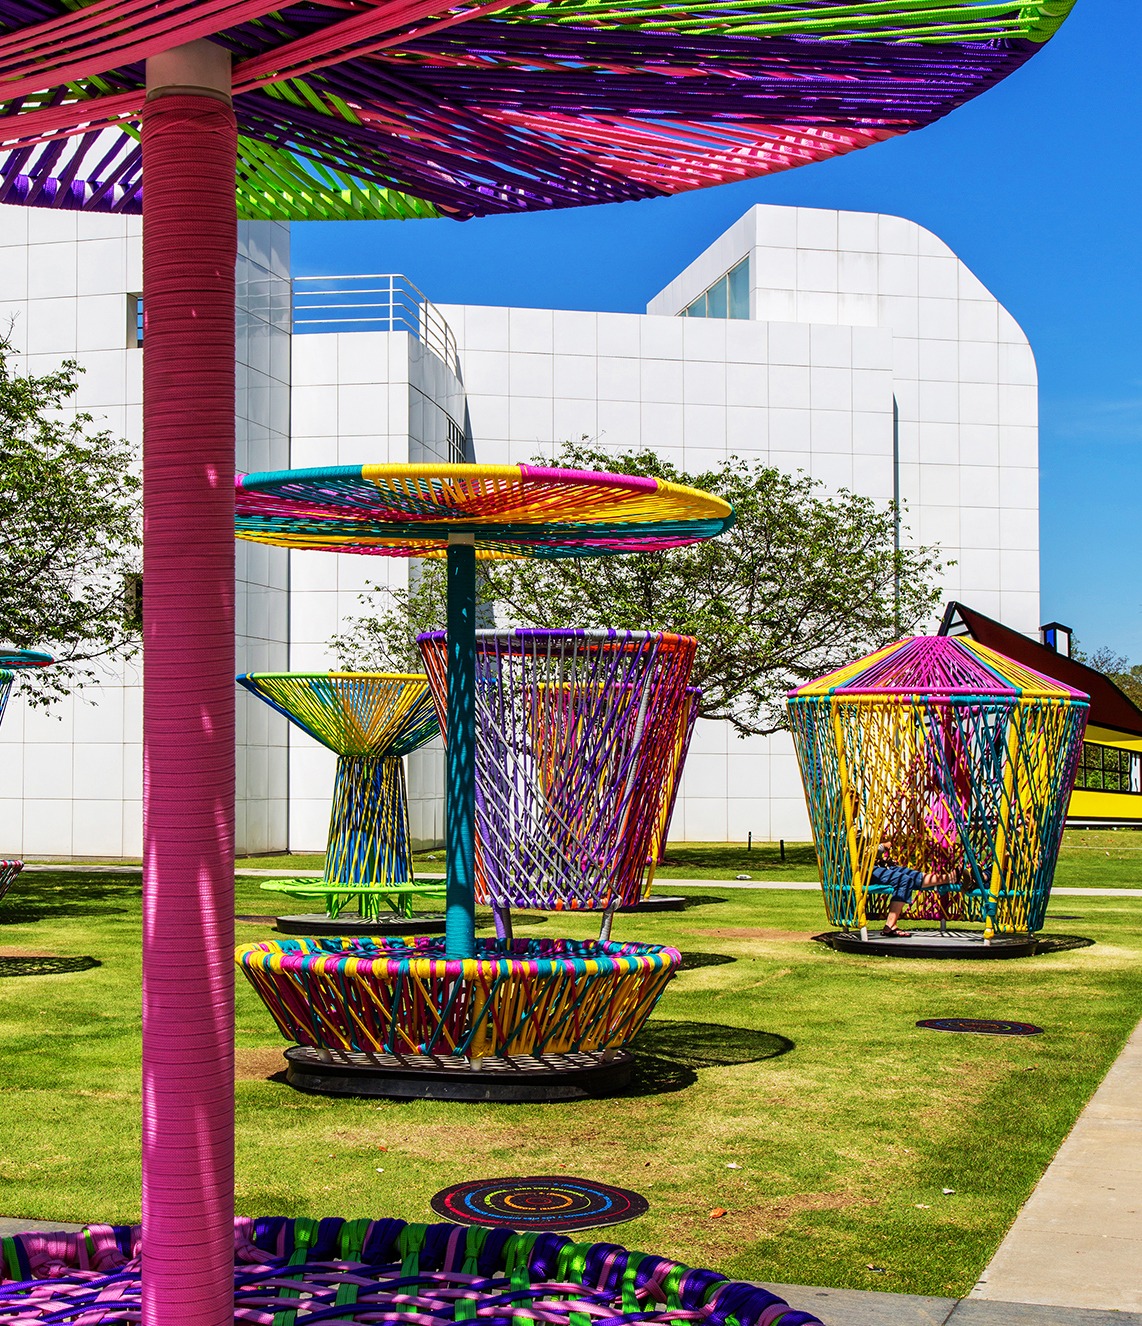 Los Trompos / High Museum of Art, Atlanta, Georgia, EUA / 2015